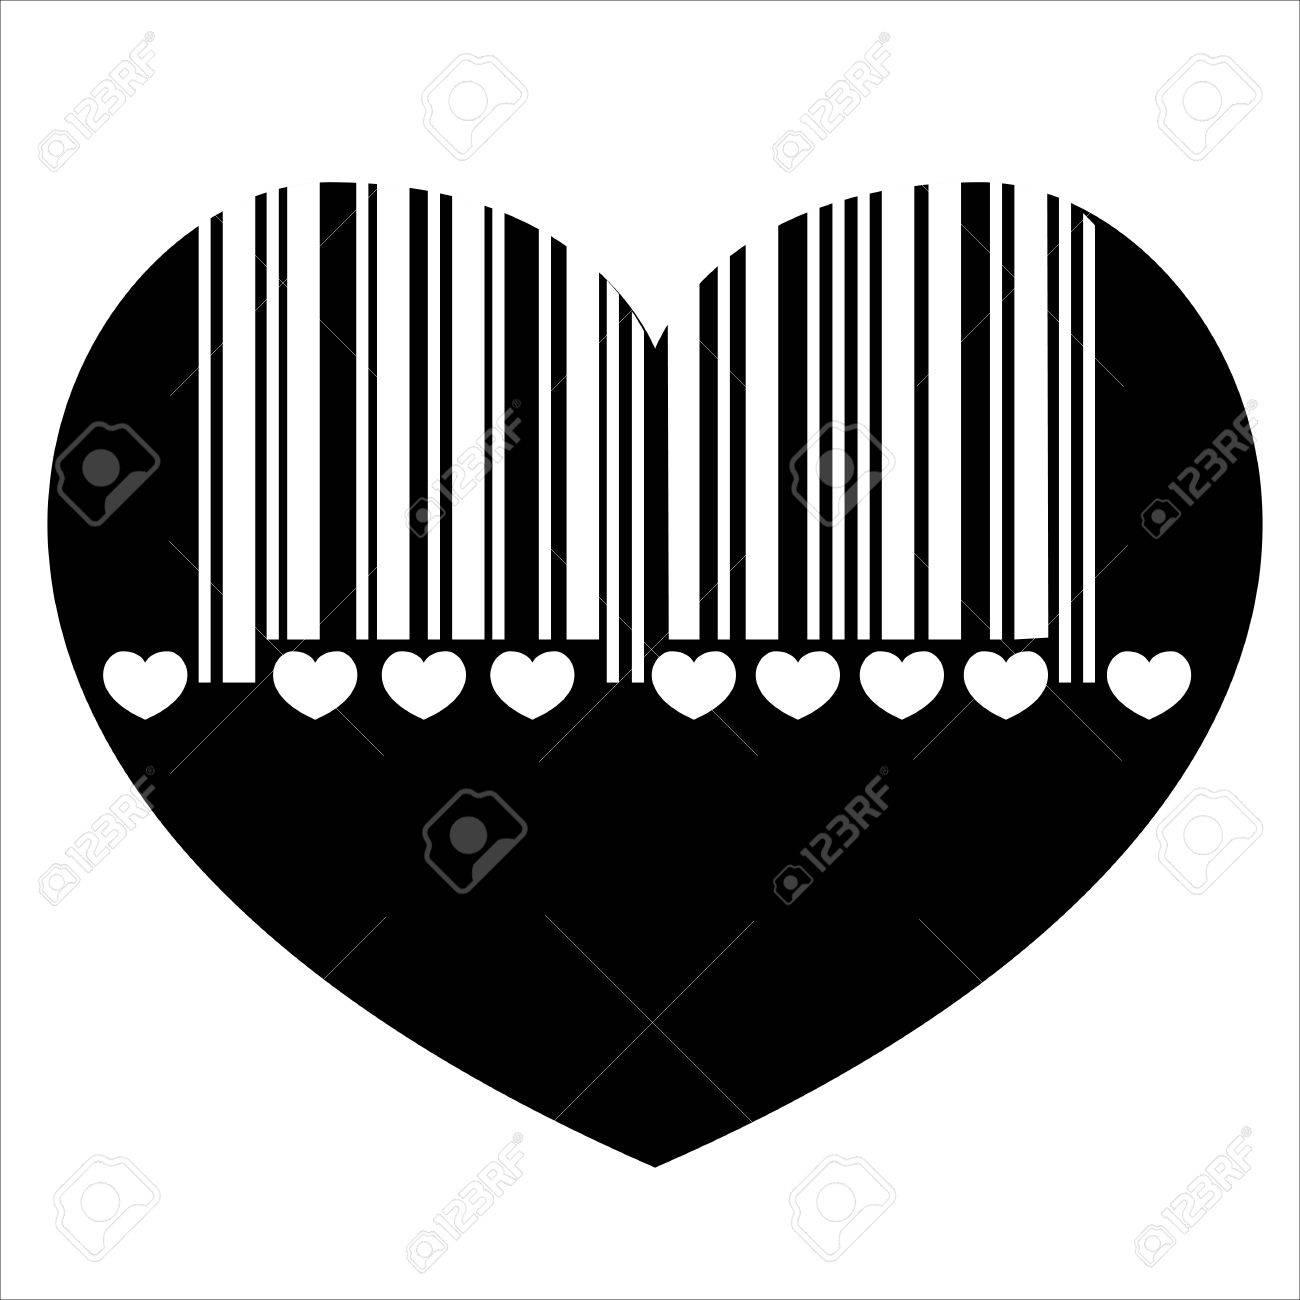 barcode heart Stock Vector - 19776326